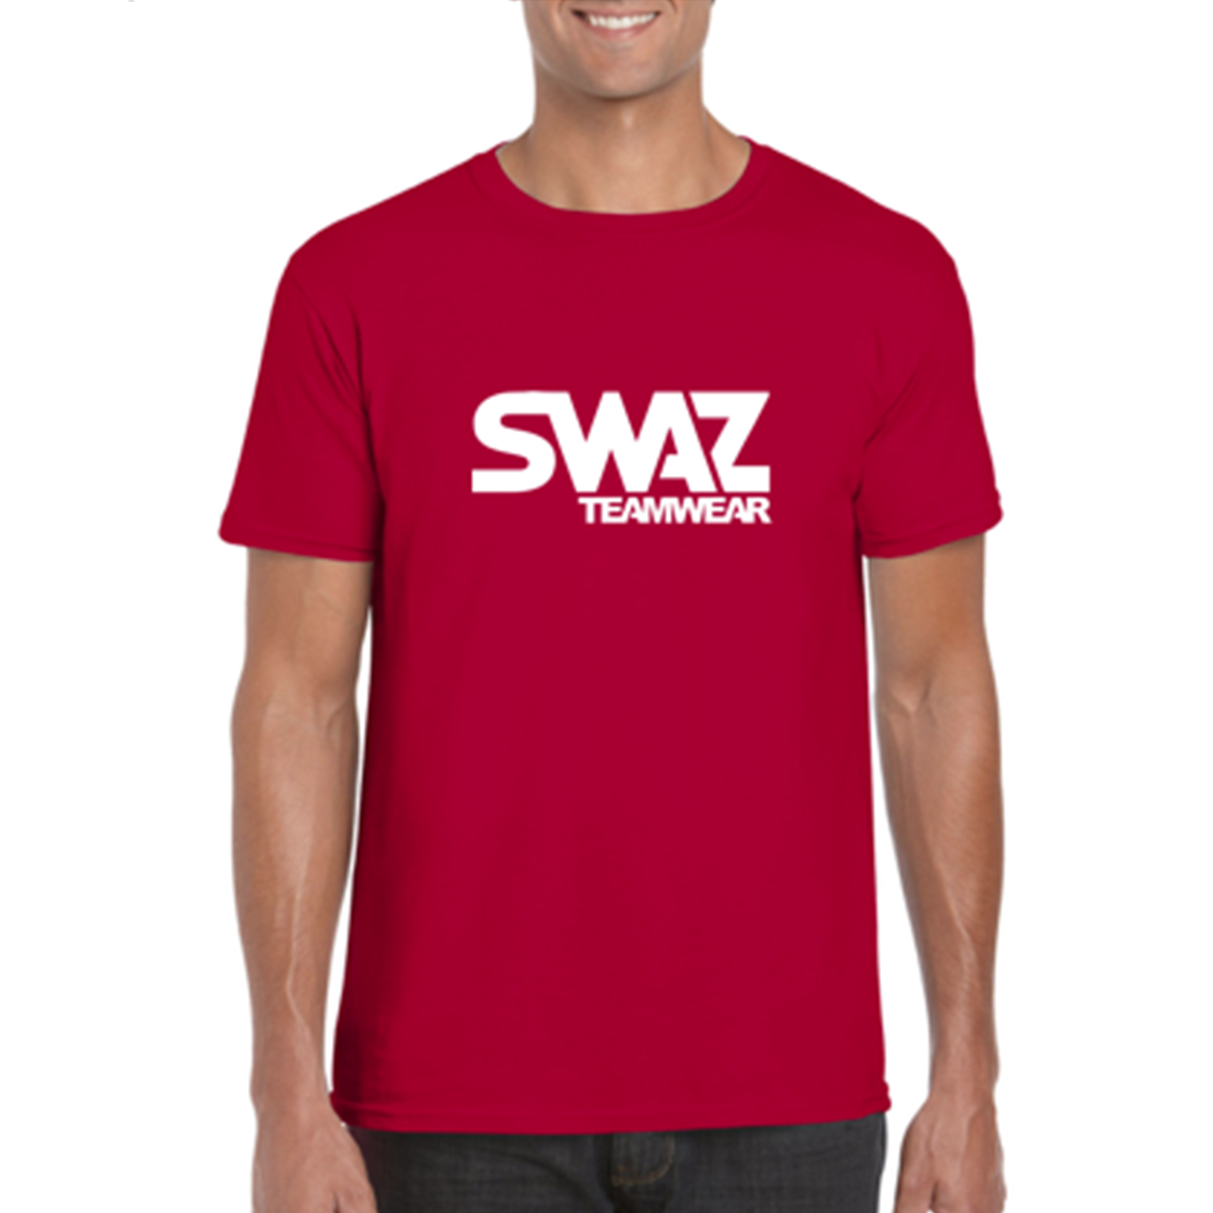 SWAZ Teamwear Cherry Red Classic T-Shirt